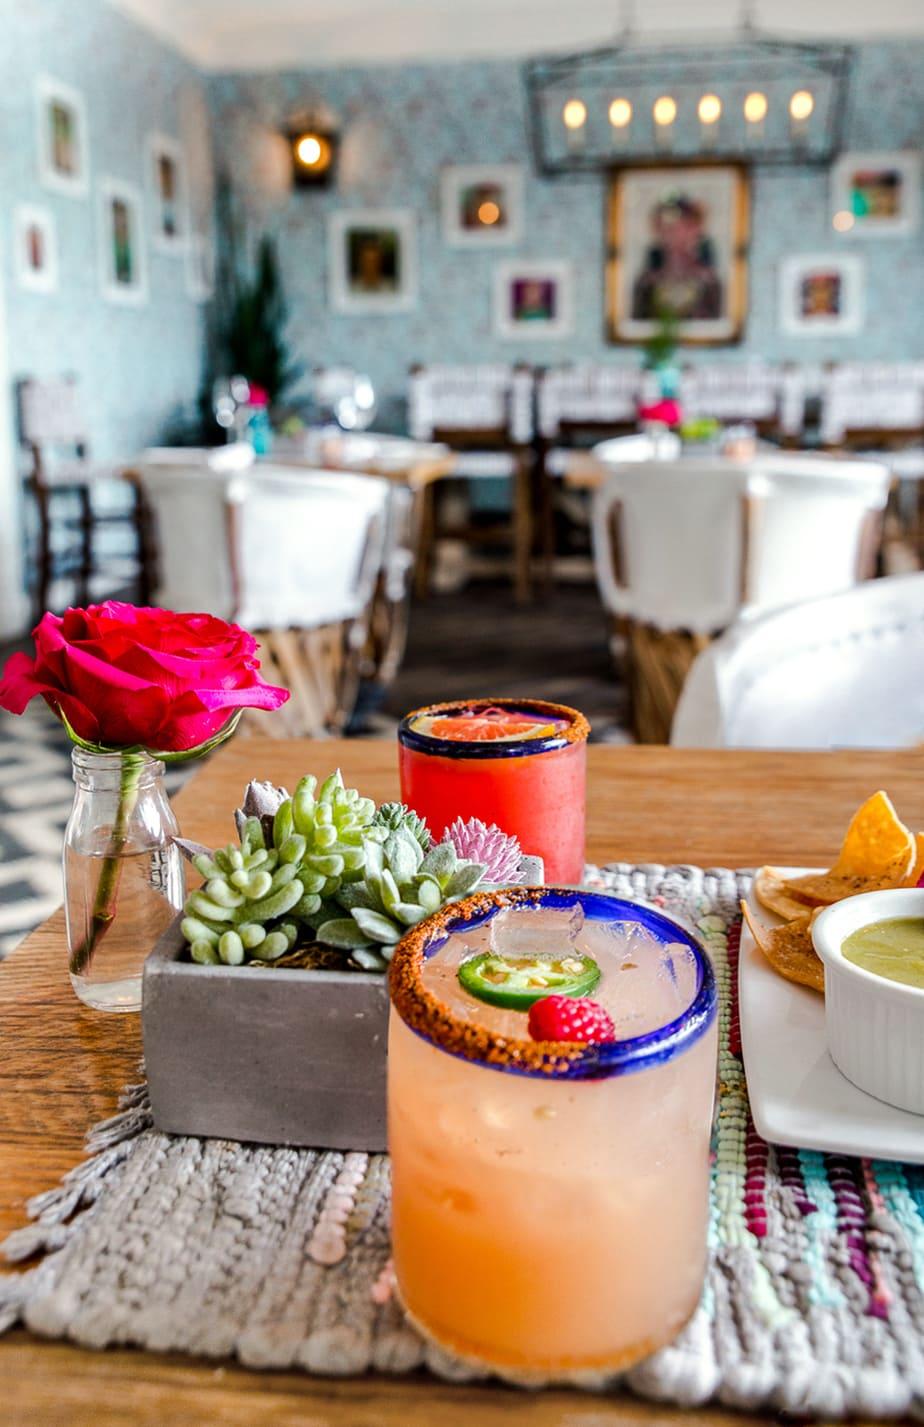 Restaurant Photographer Los Angeles, California